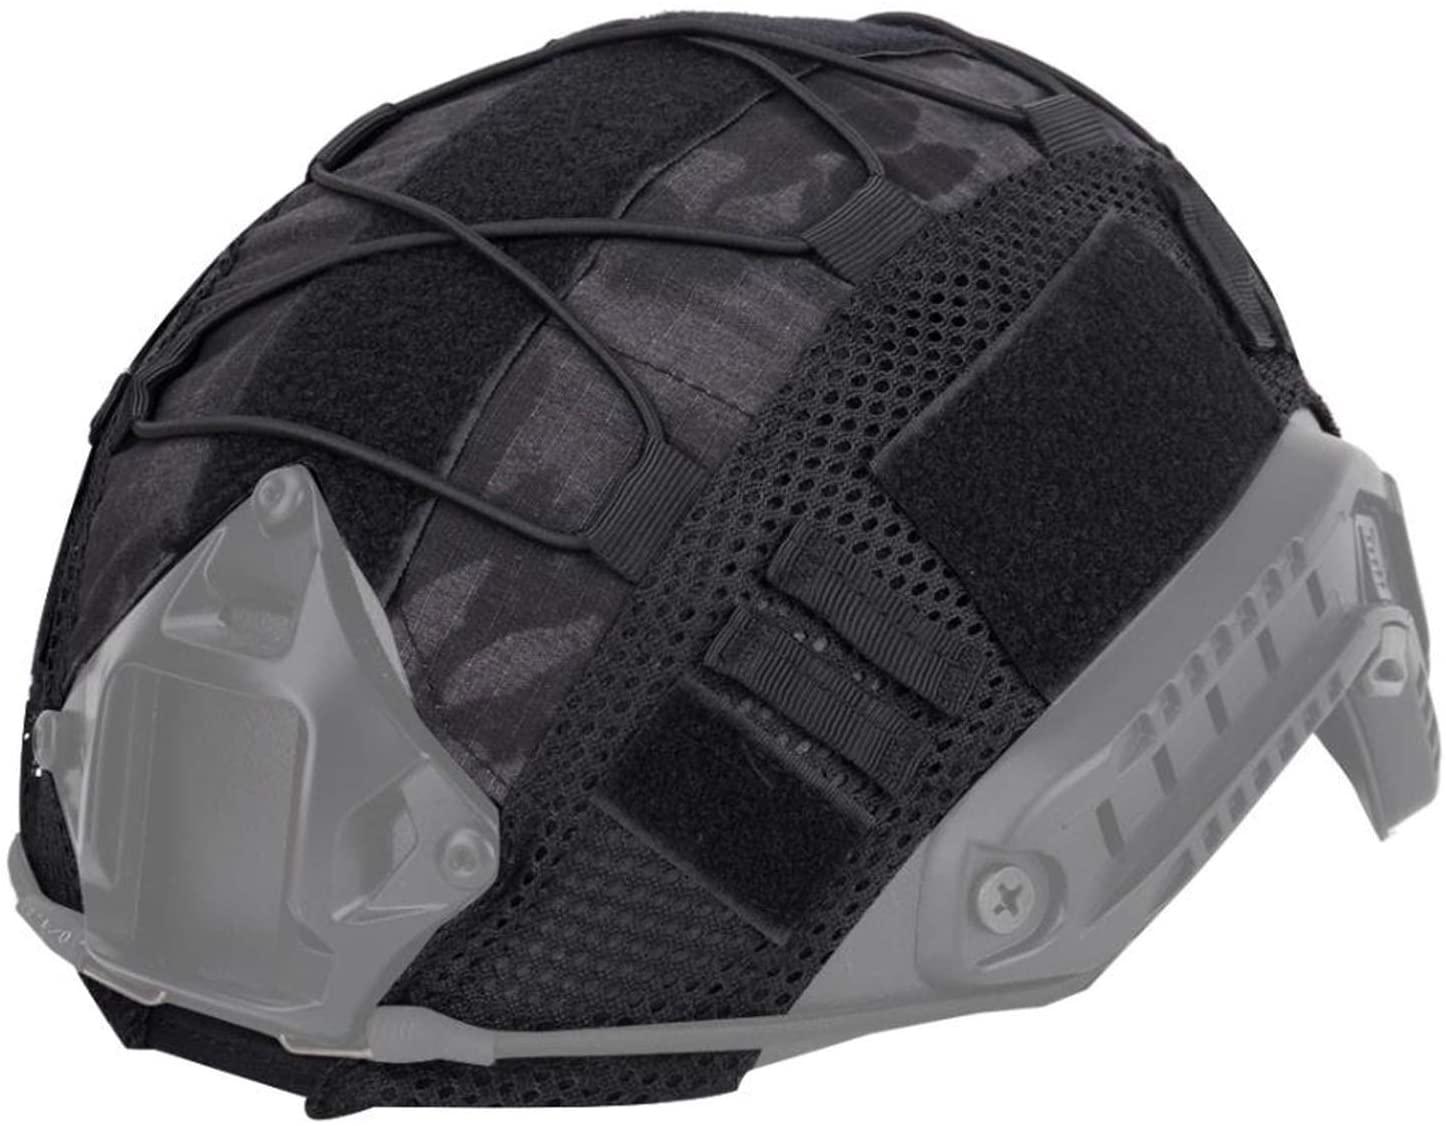 Jadedragon Multicam Camouflage Helmet Cover Army Tactical Series Airsoft Paintball Fast Helmet Cover-No Helmet